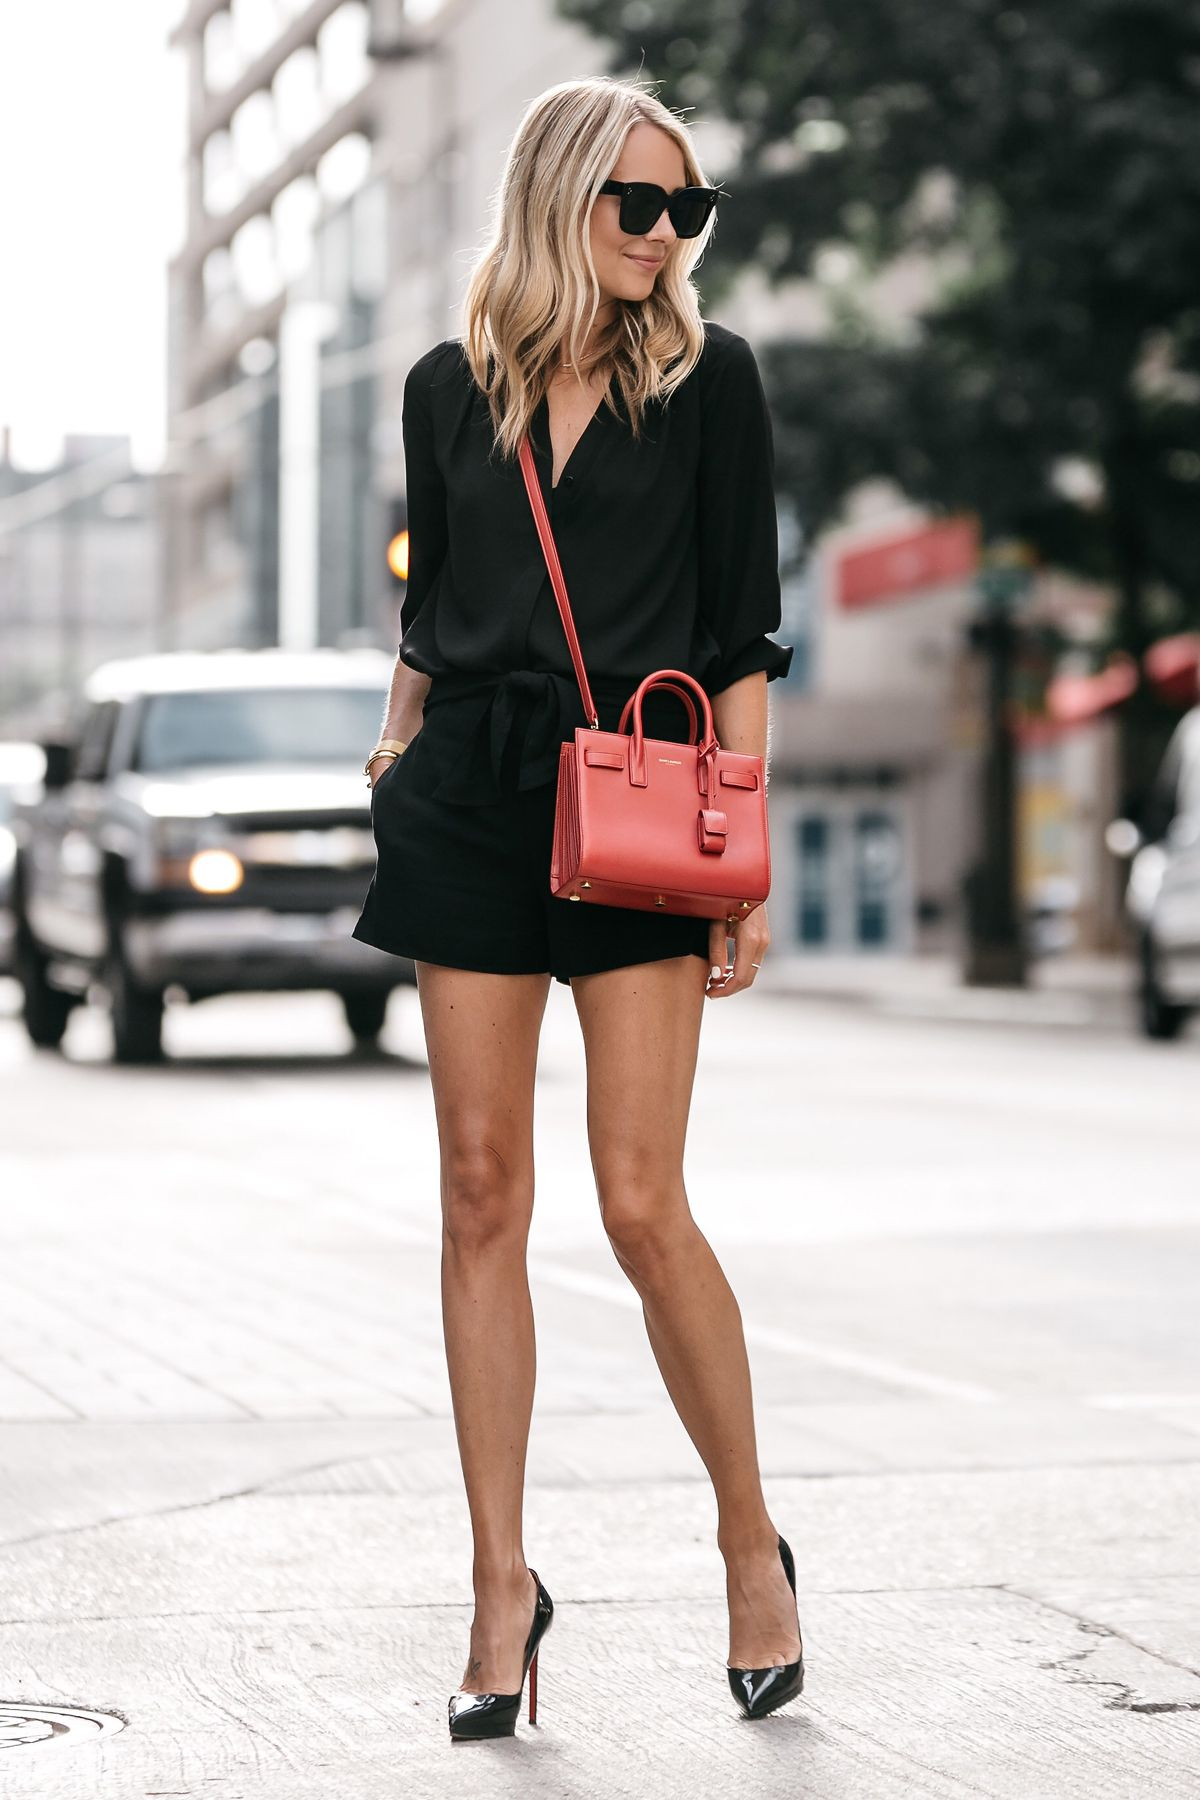 d0febd0b812 Blonde Woman Wearing Nordstrom Black Blouse Nordstrom Black Tie Front Shorts  YSL Sac De Jour Nano Red Christian Louboutin Black Pumps Street Style Outfit  ...